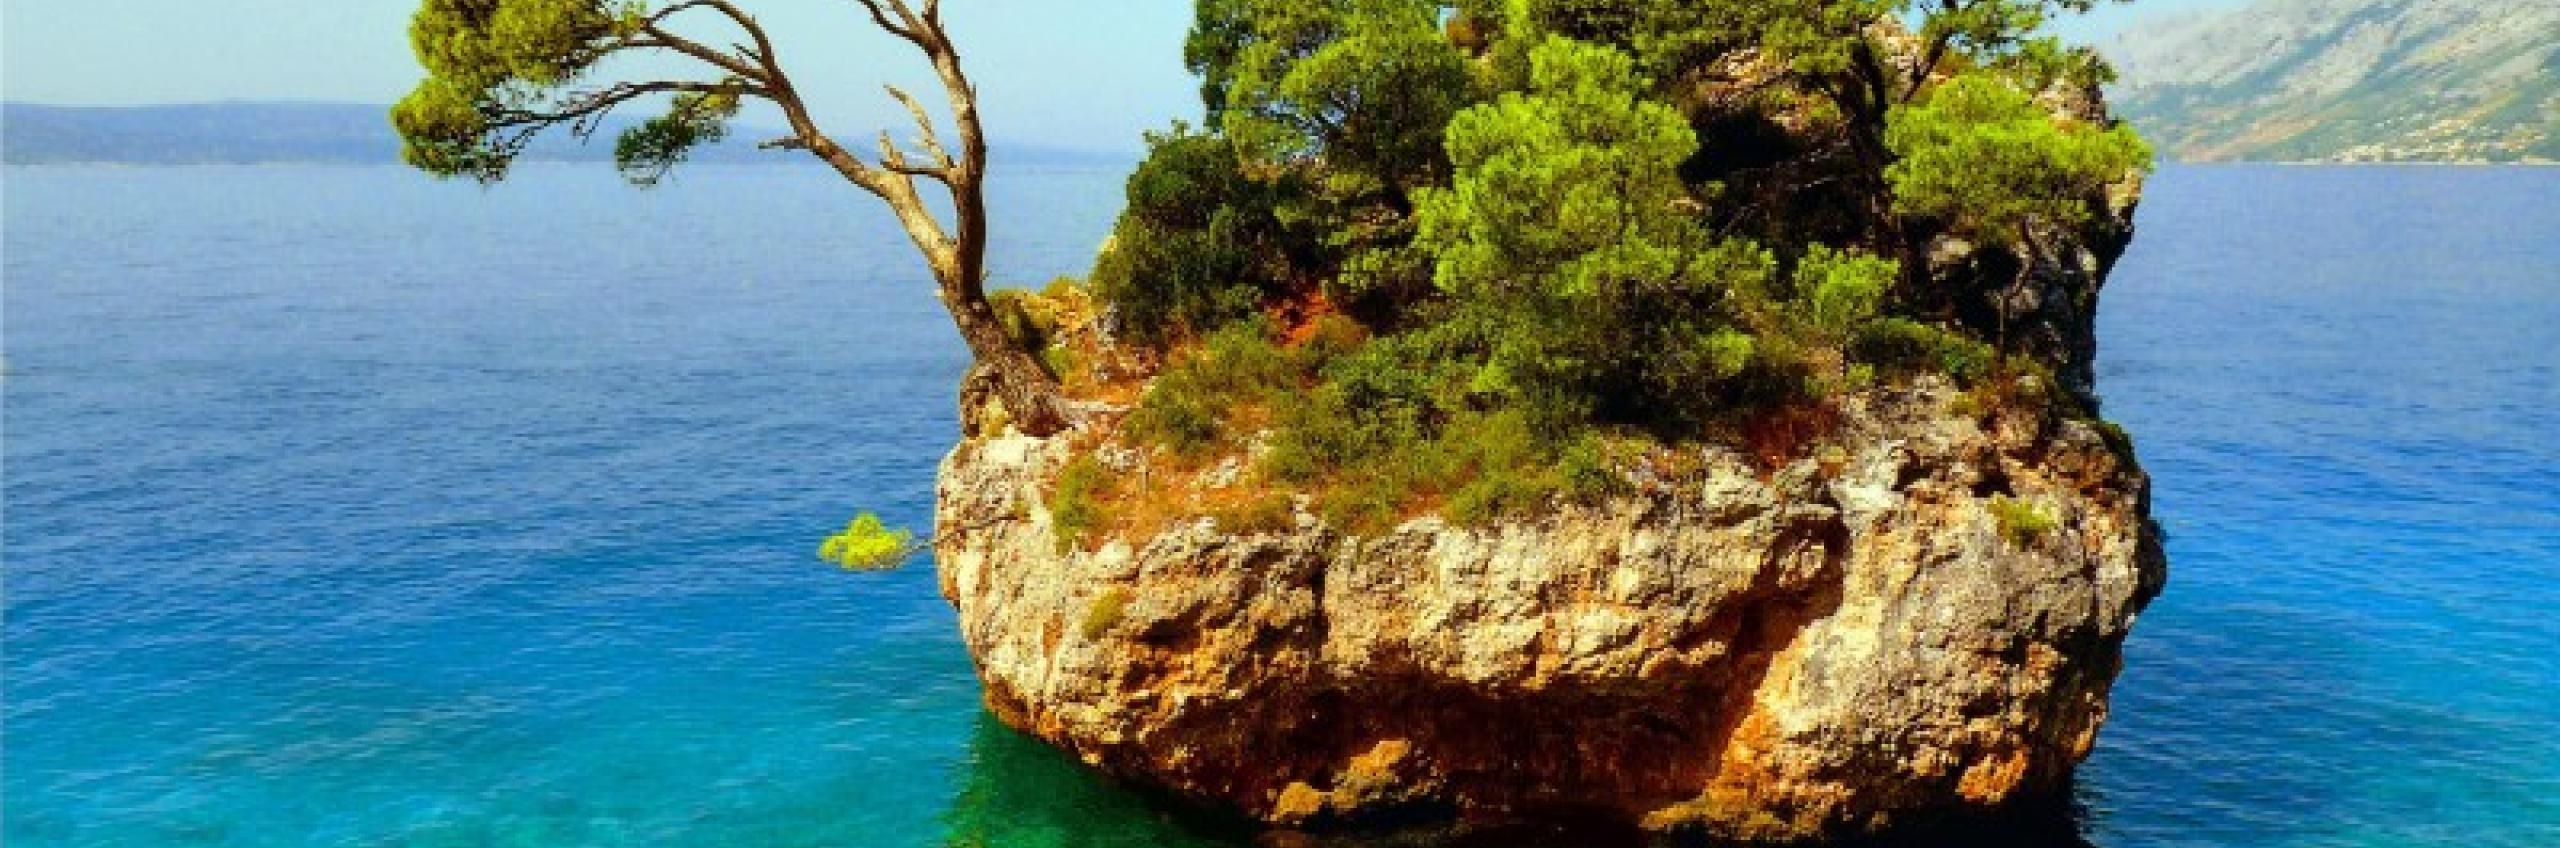 Croatia: Crystal clear waters